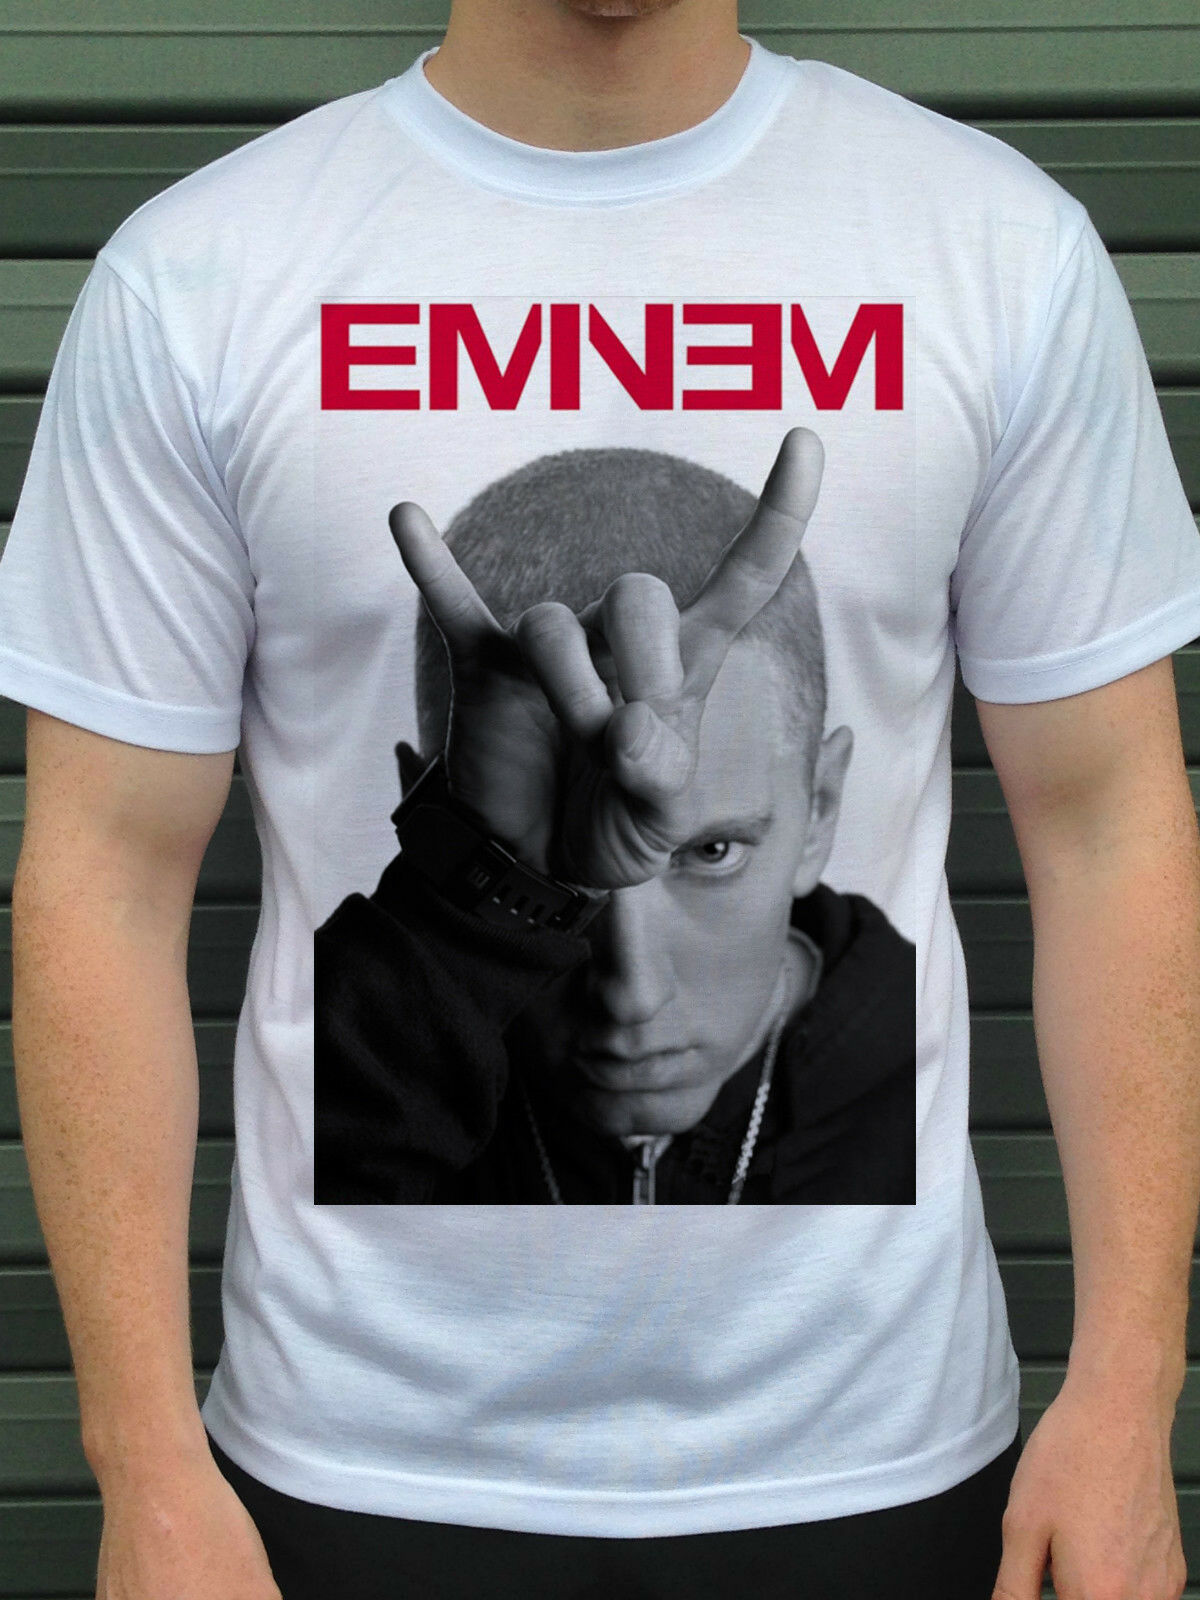 Camiseta de Eminem, S M XL 2XL 3XL hip hop/rap rapero cool stylish Tshirt camiseta suelta Negro hombres camisetas Homme